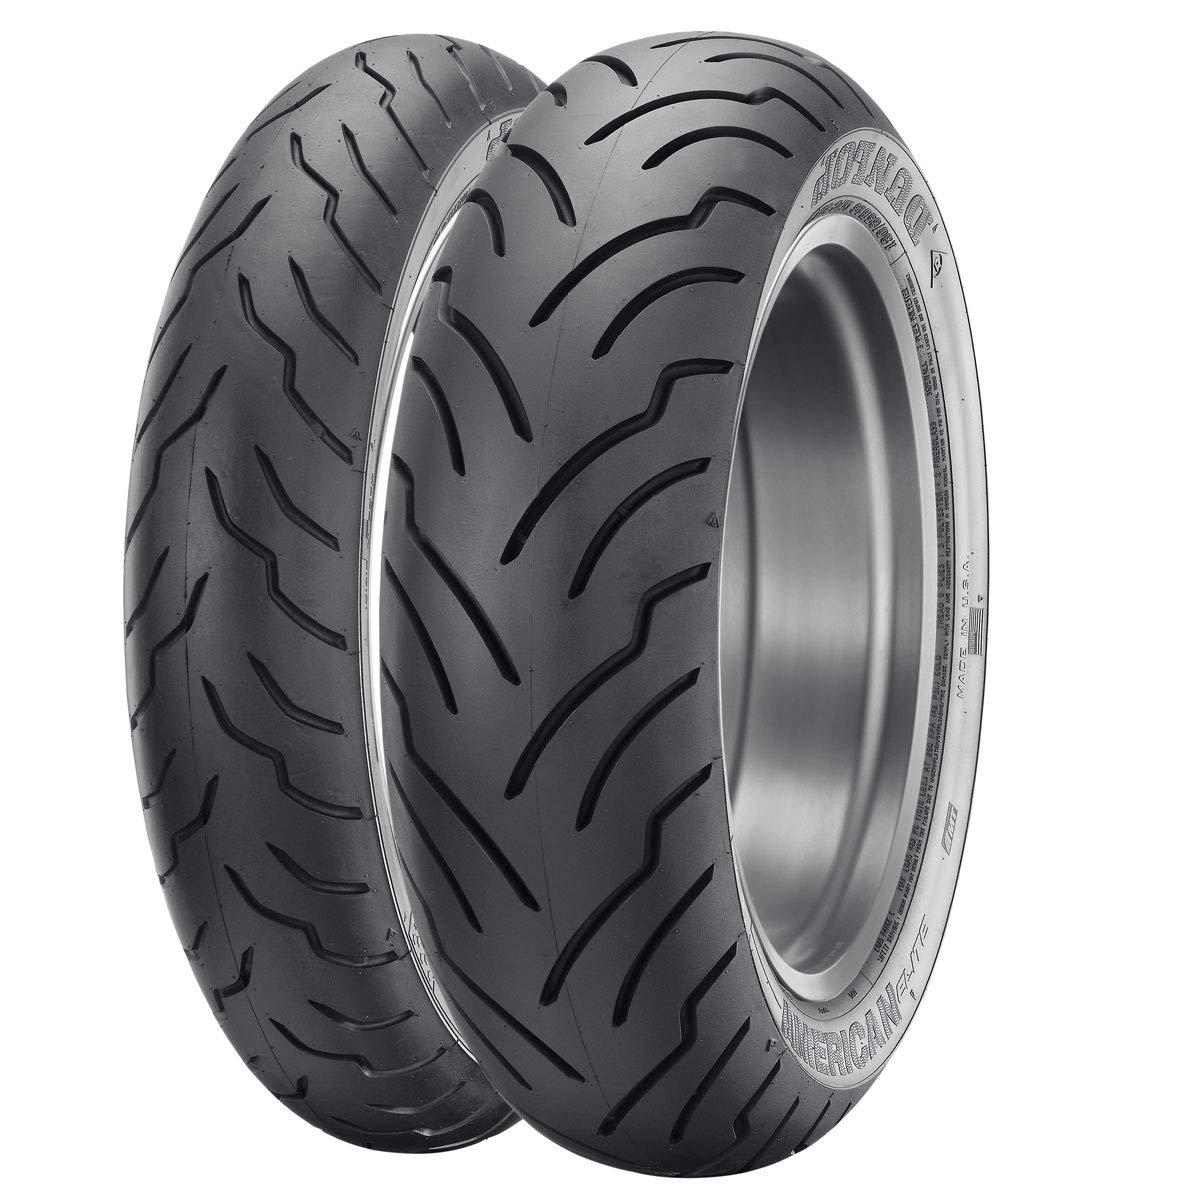 Dunlop American Elite MU85B16 Rear Tire 34AE-23